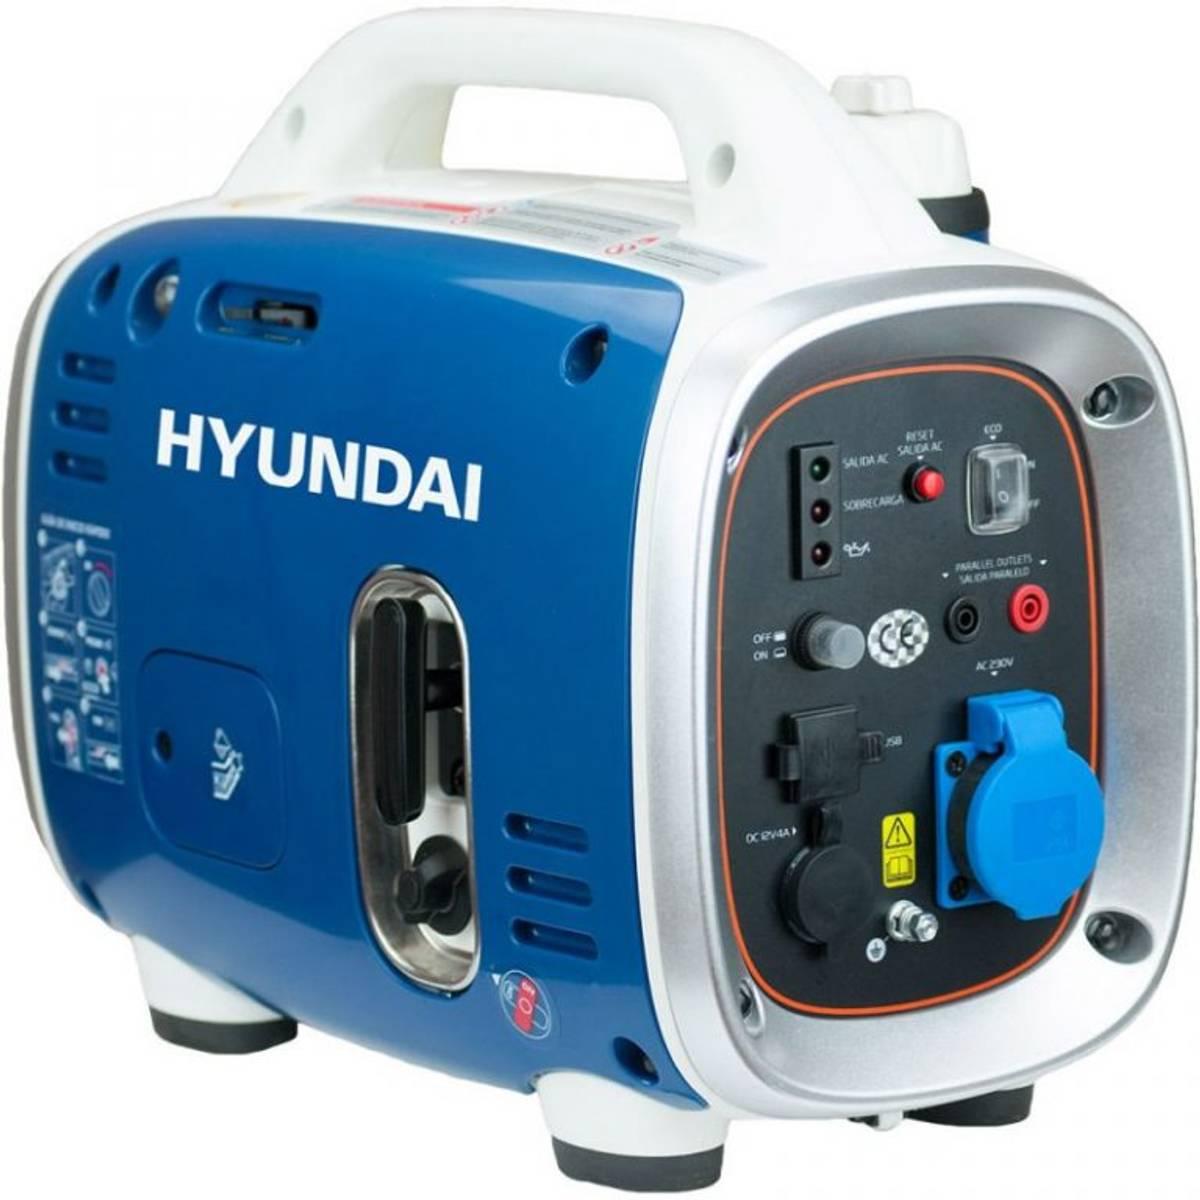 HYUNDAI HY900Si Inverter Aggregat 900W